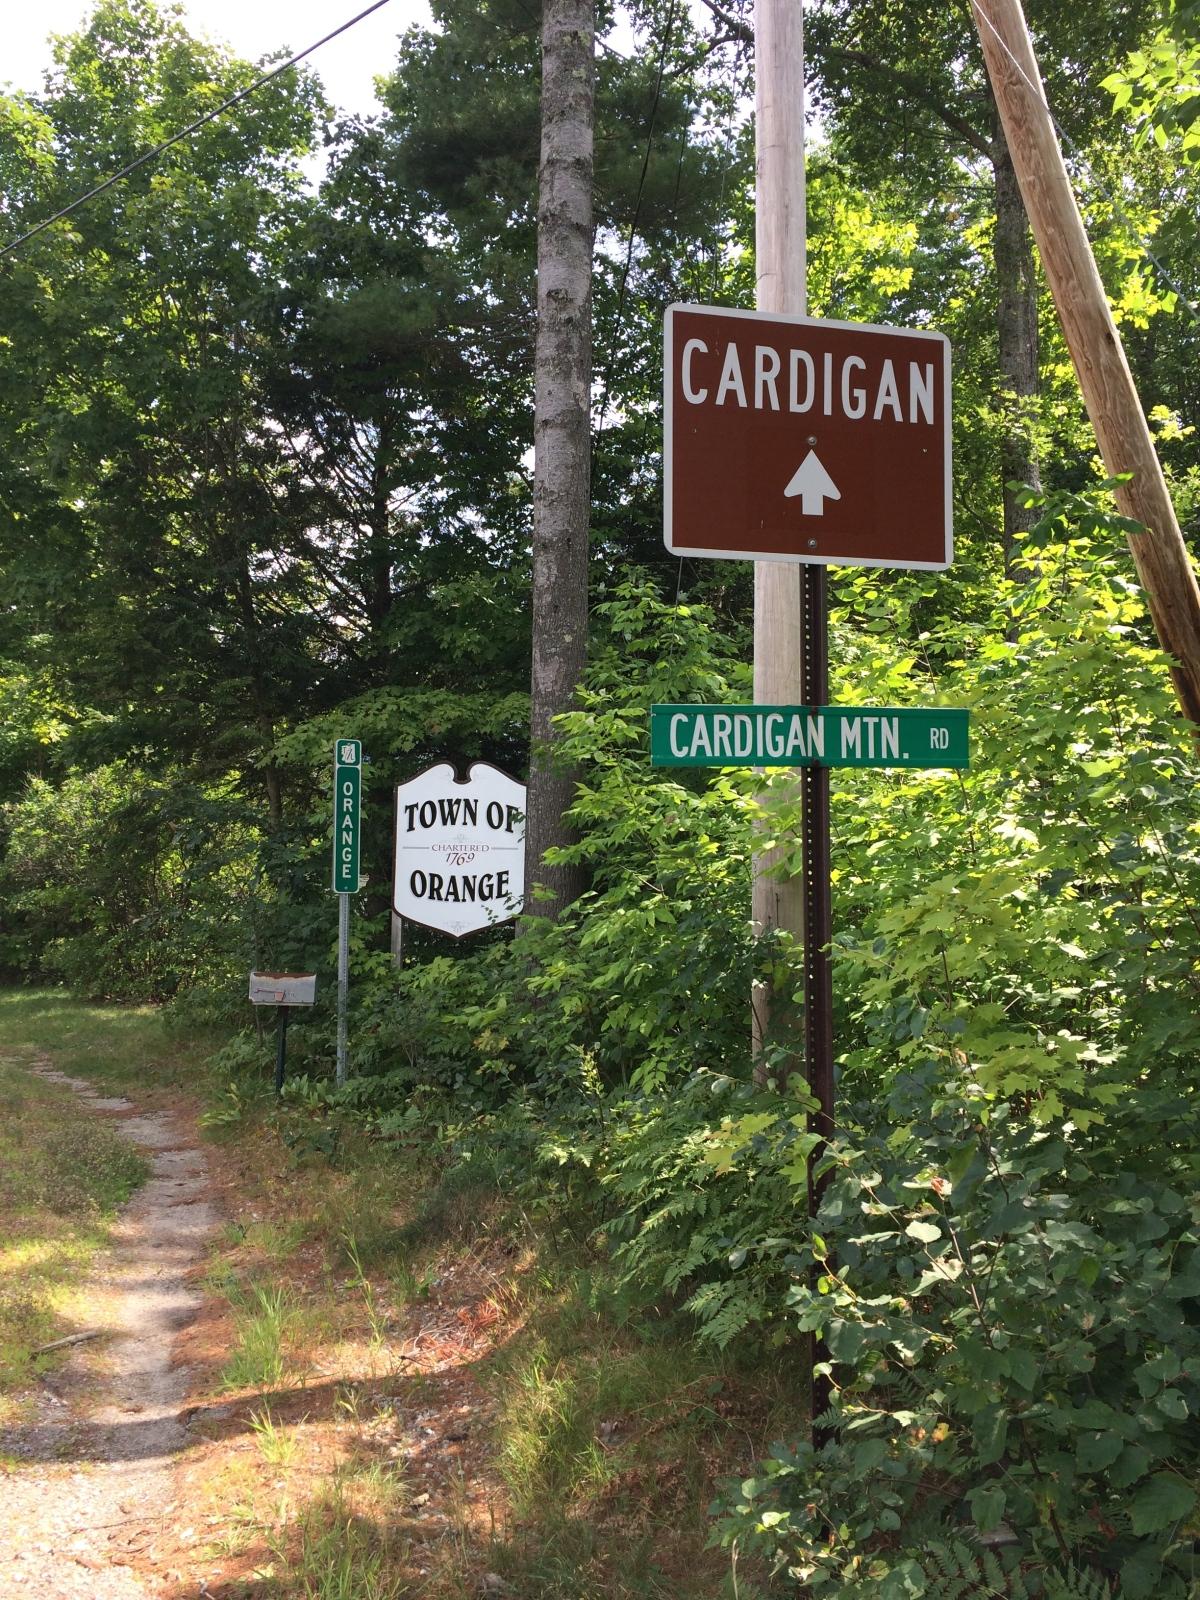 On Climbing Cardigan:August